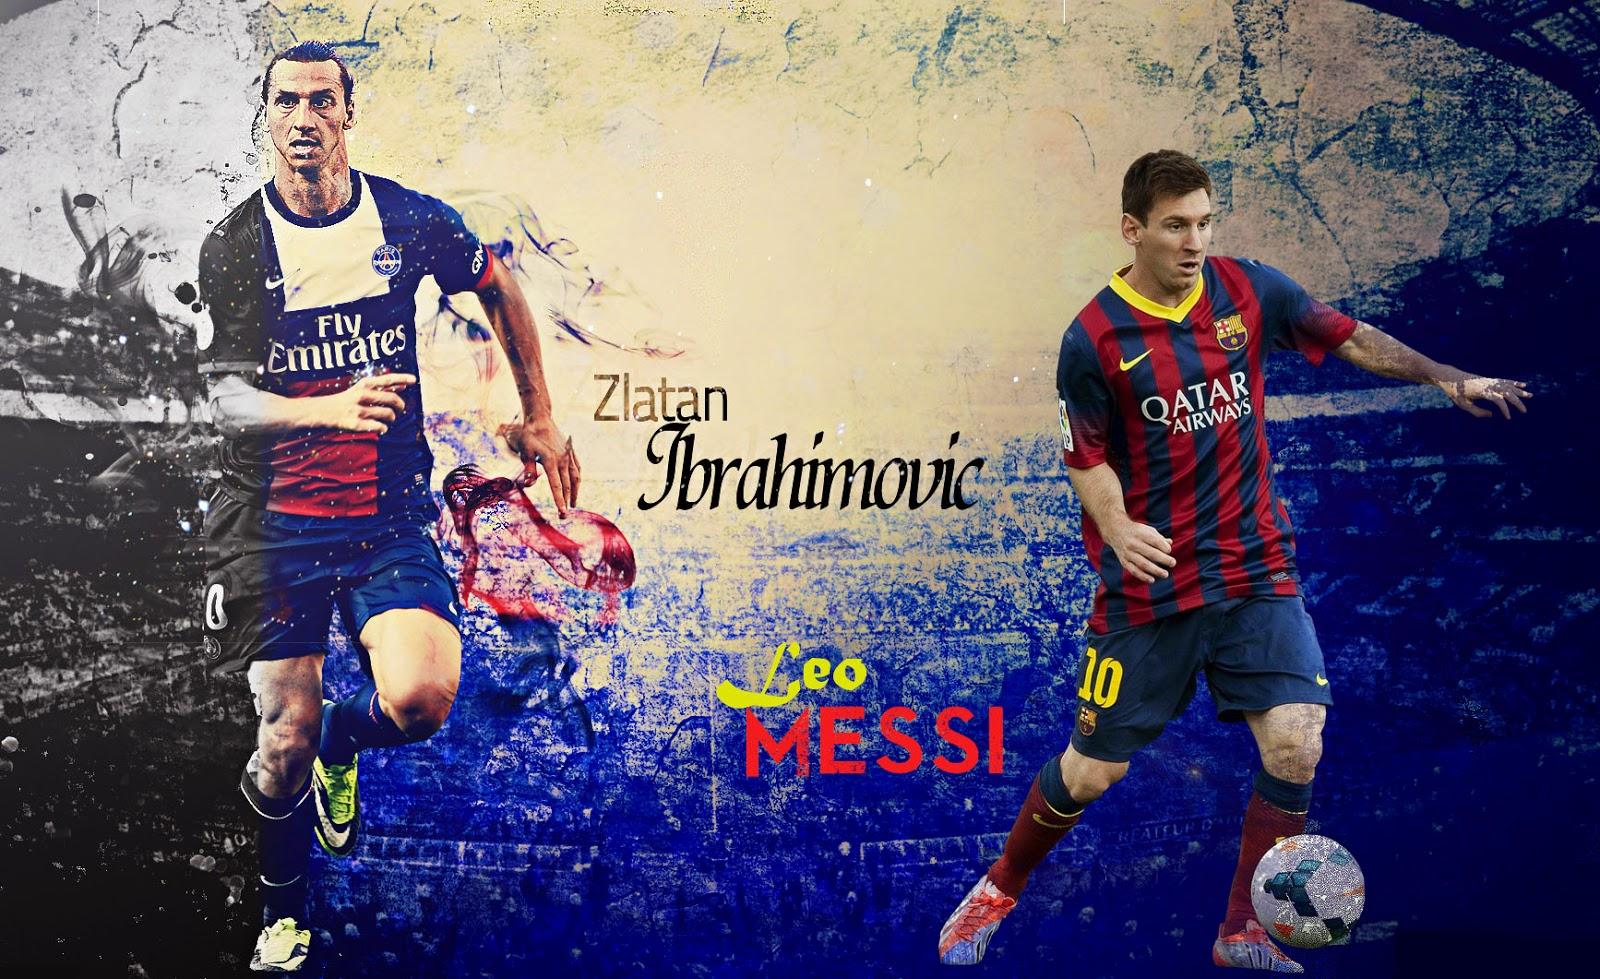 Híbrido Messi - Ibrahimovic FIFA 15 Ultimate Team, Hybrid Messi - Ibrahimovic FUT 15